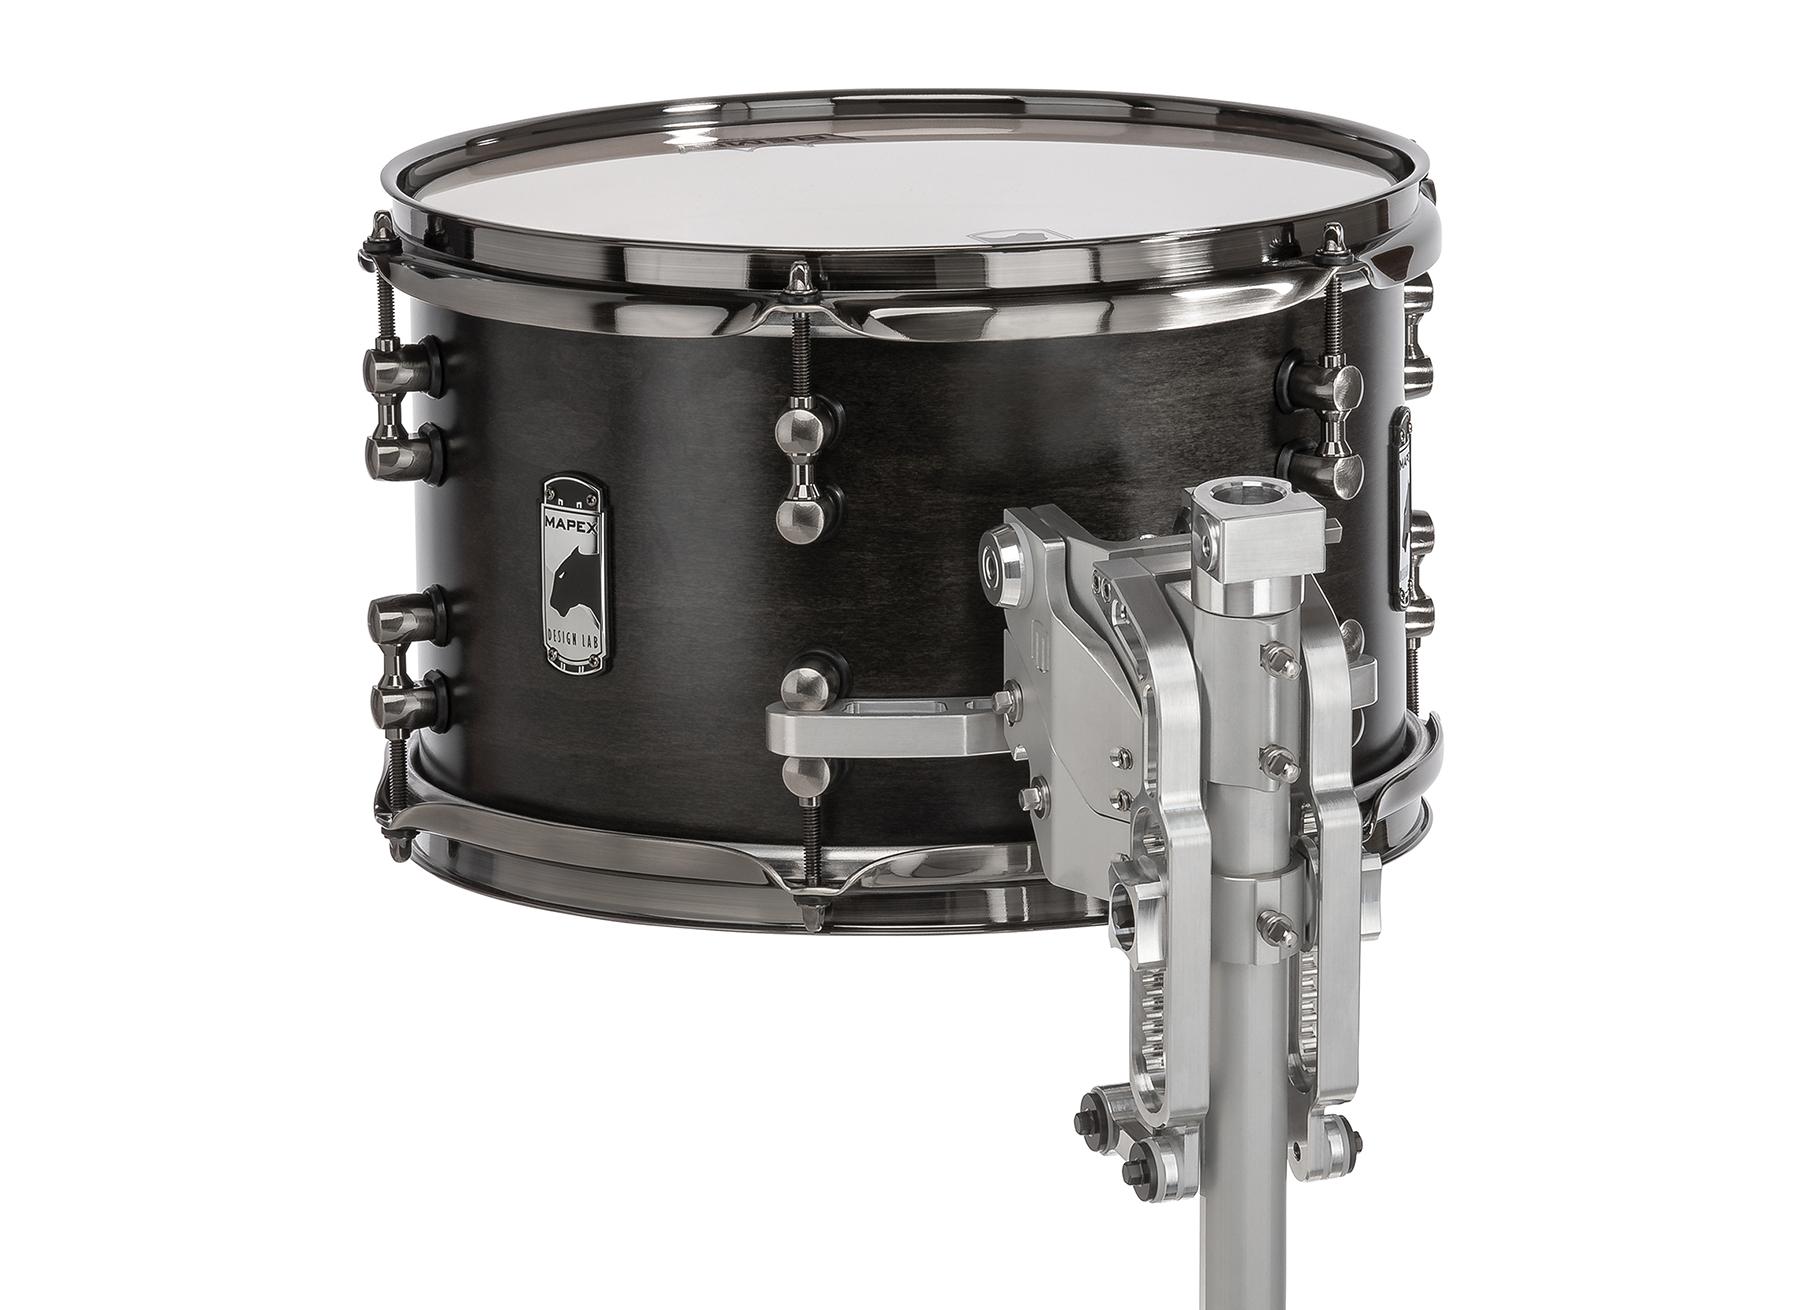 MAATS-with-drums-03.jpg